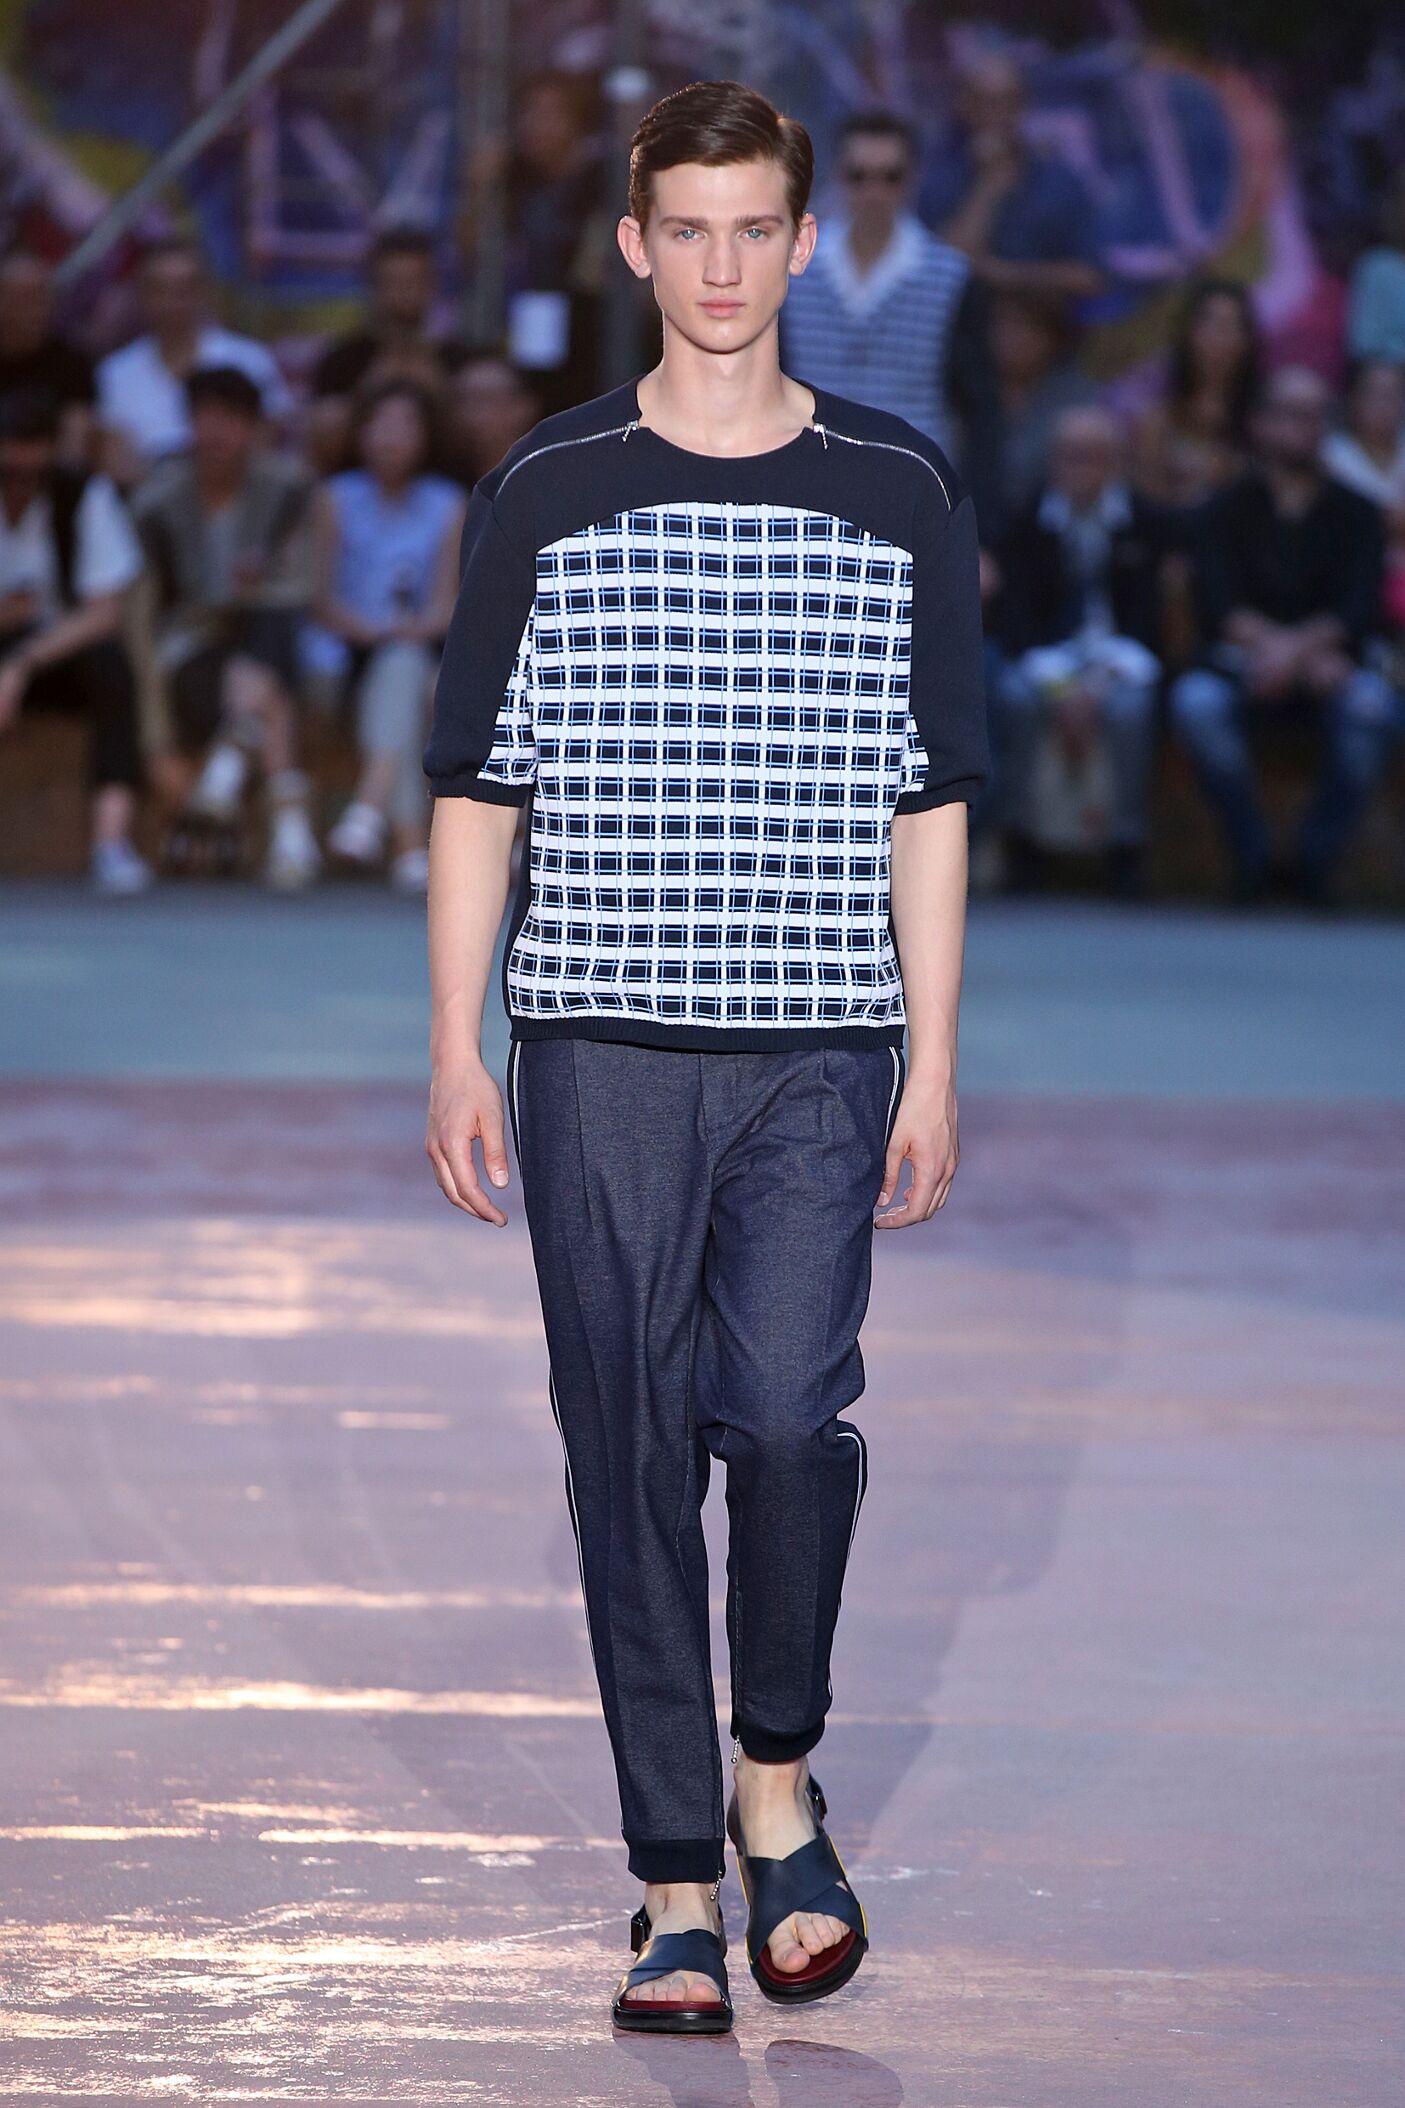 Catwalk Antonio Marras Man Fashion Show Summer 2015